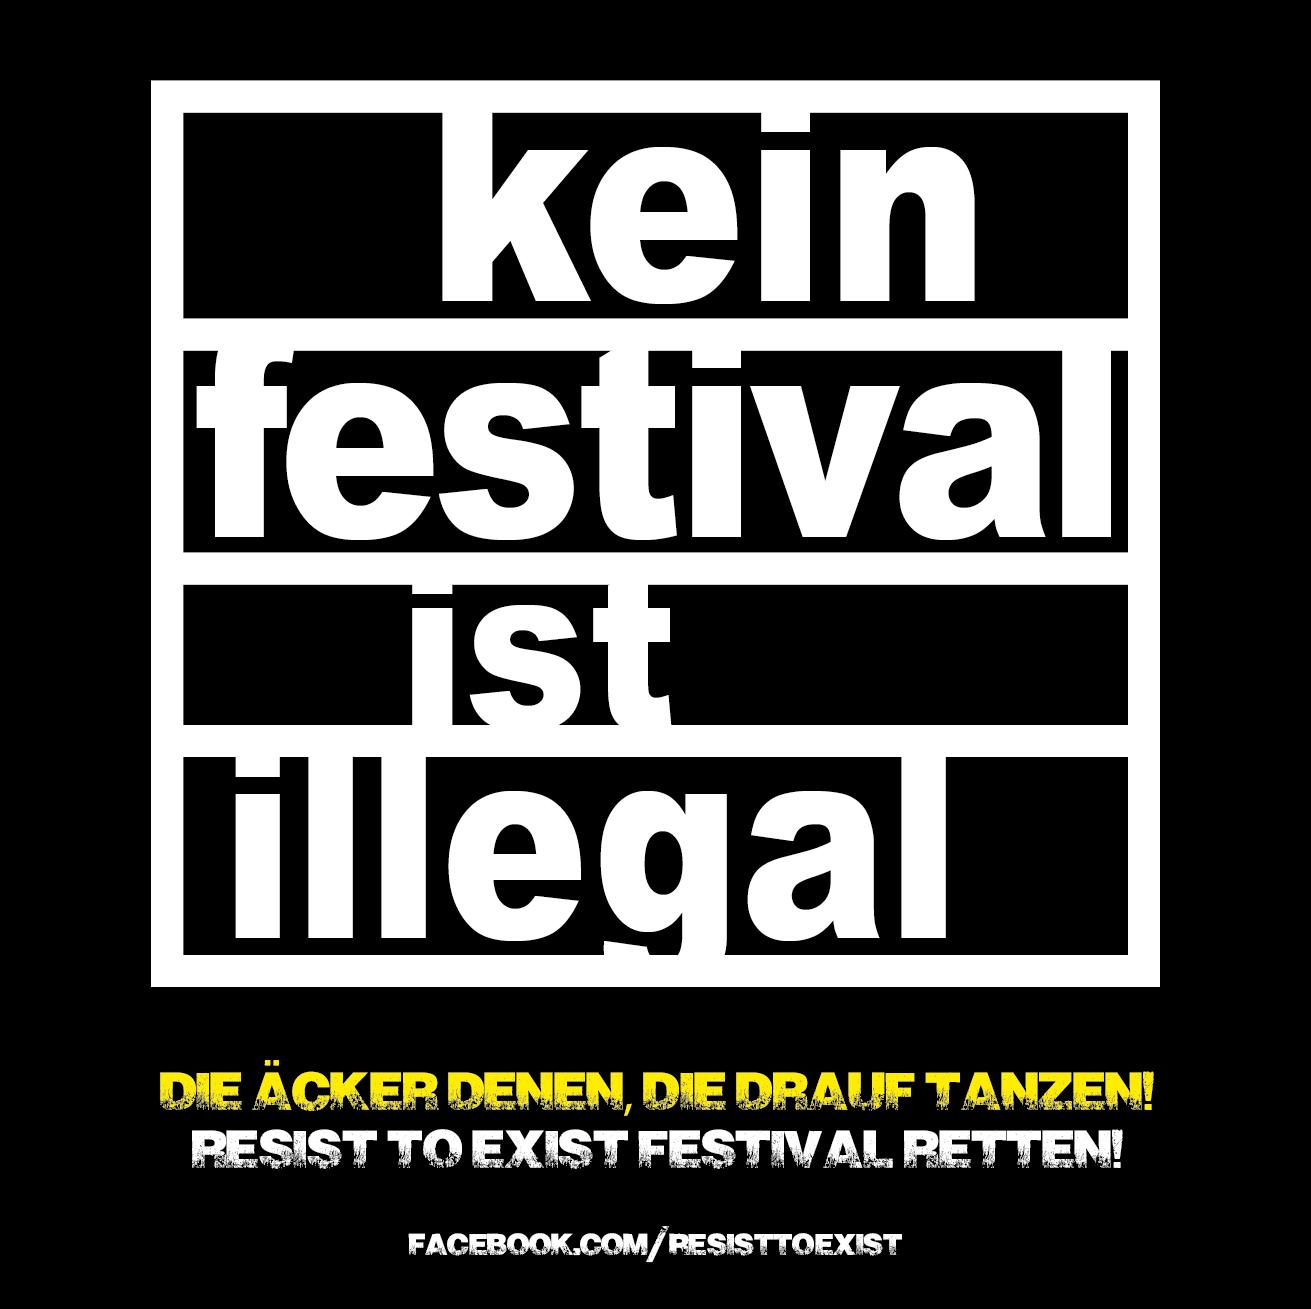 Kein Festival ist illegal